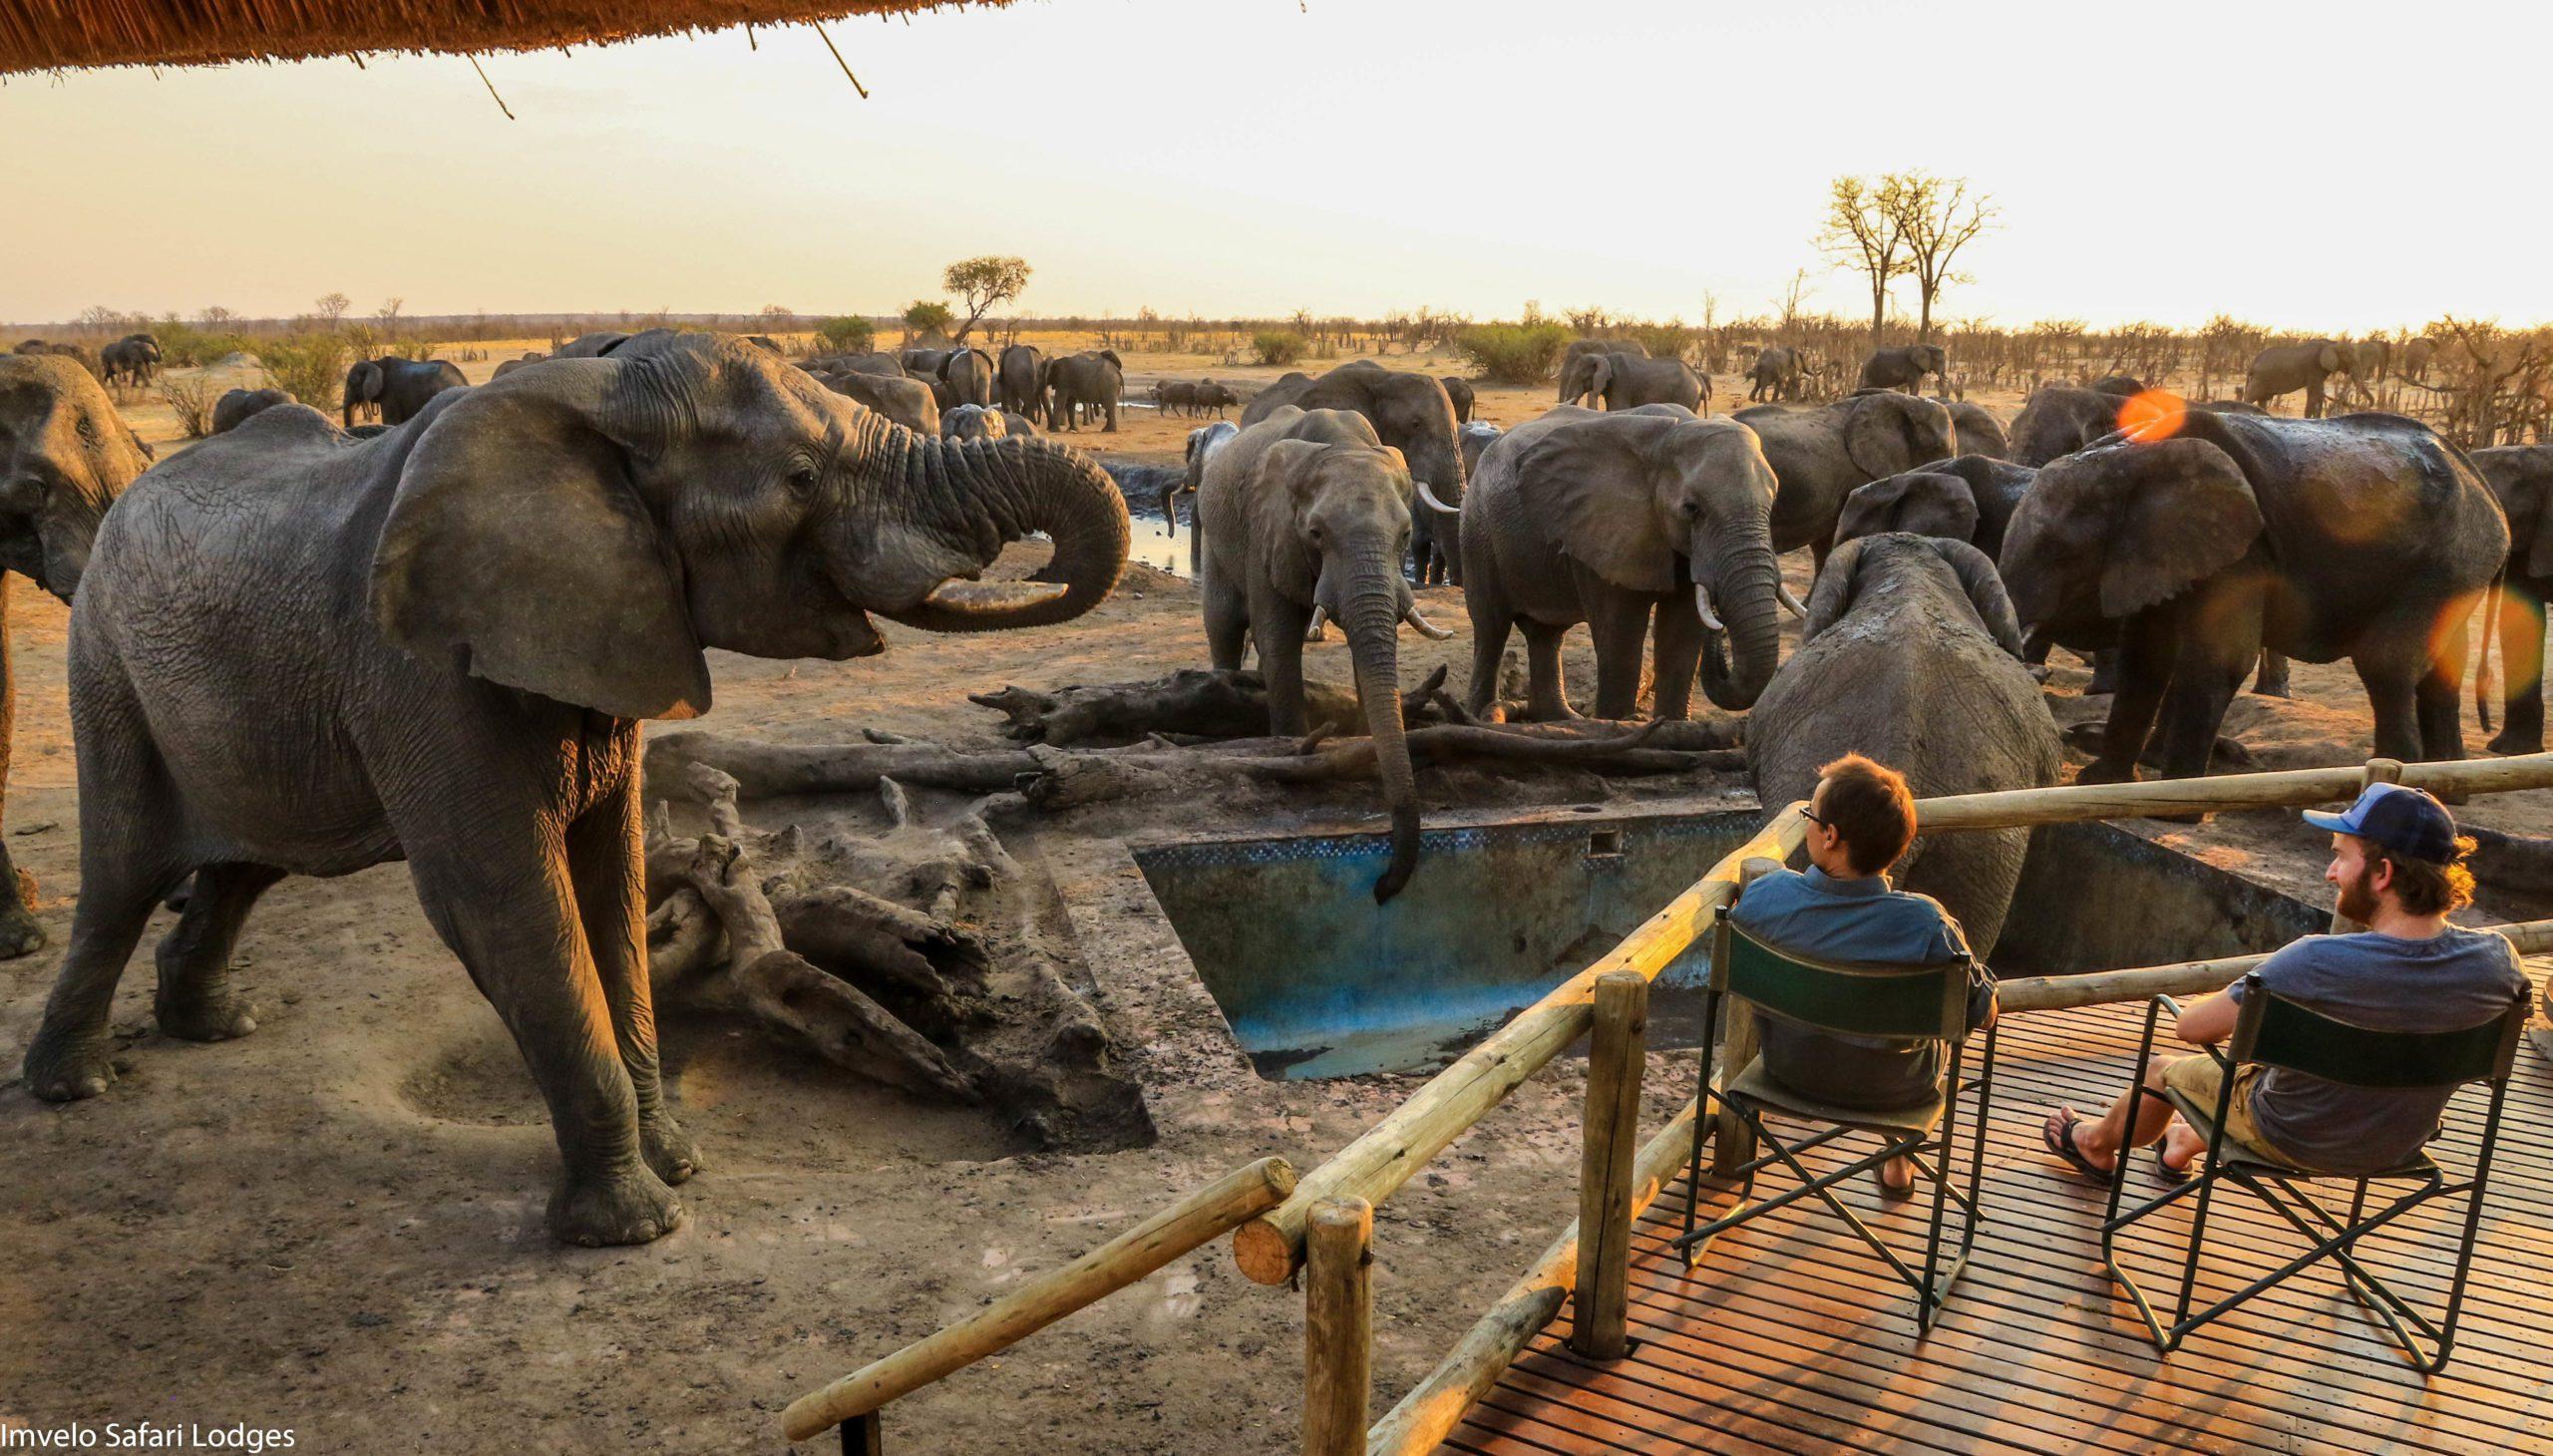 Nehimba Lodge on this Southern Africa family safari